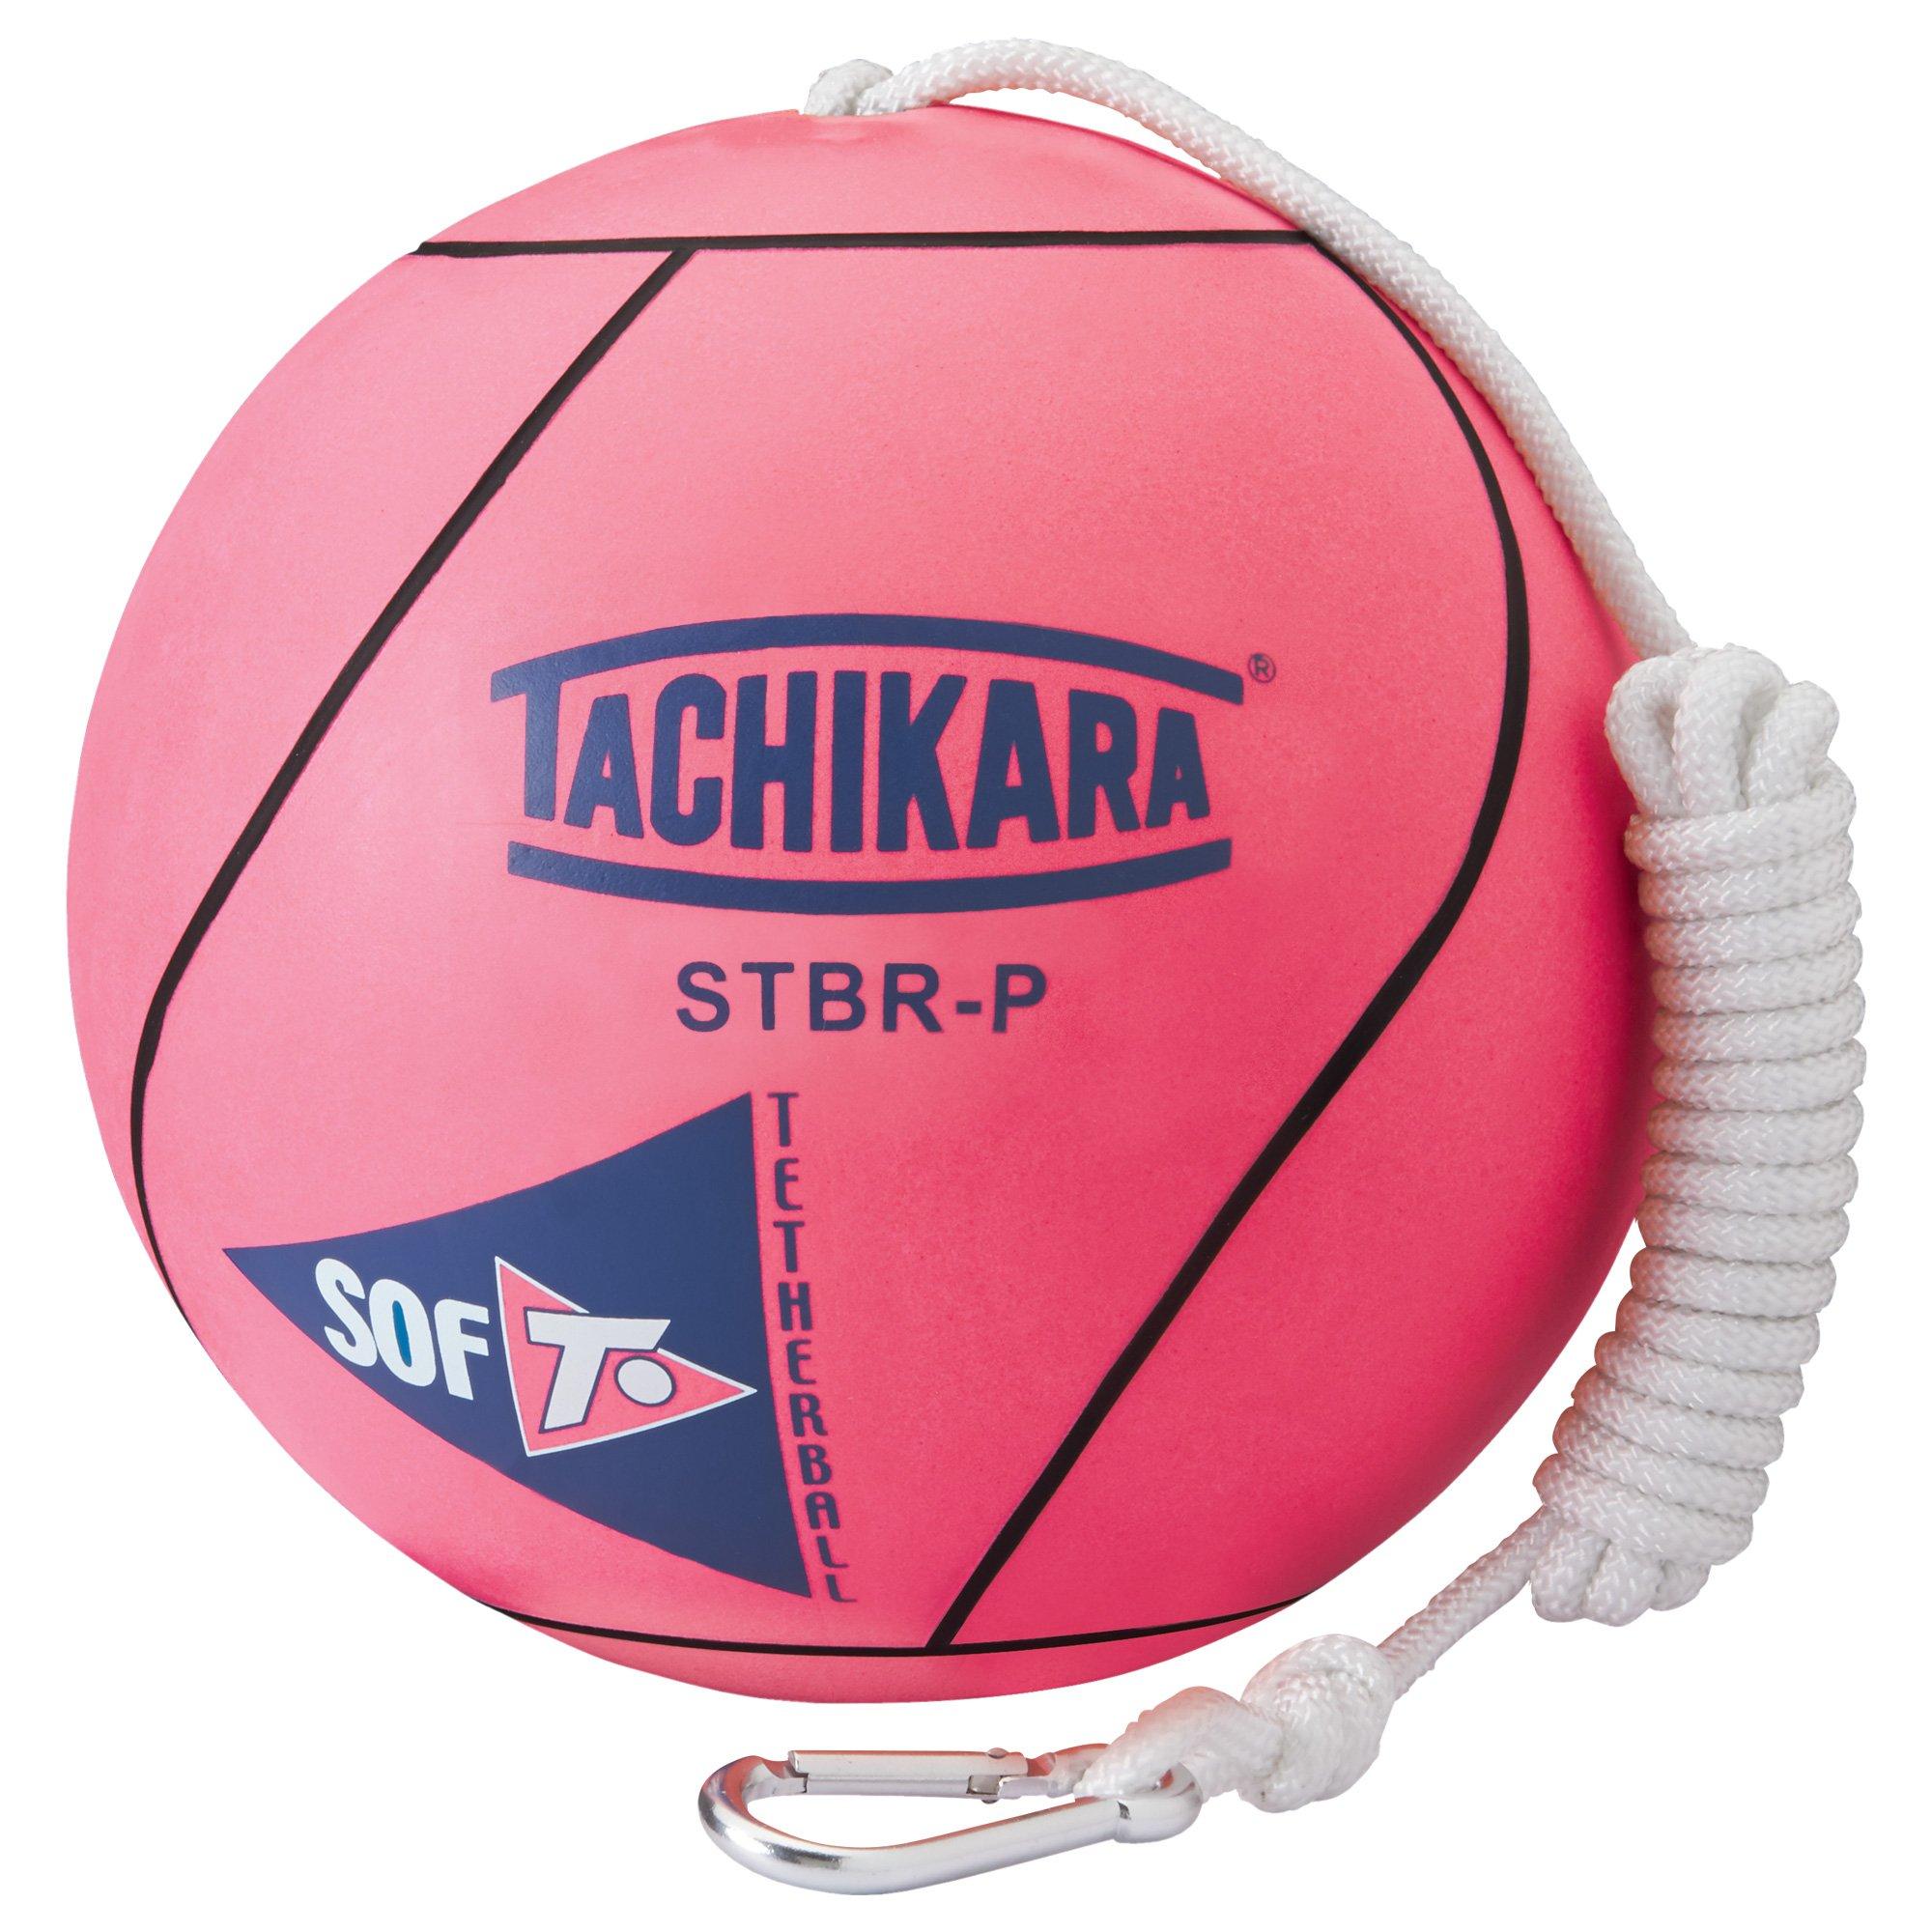 TACHIKARA STBR-P Extra Soft Tetherball (Pink). by TACHIKARA